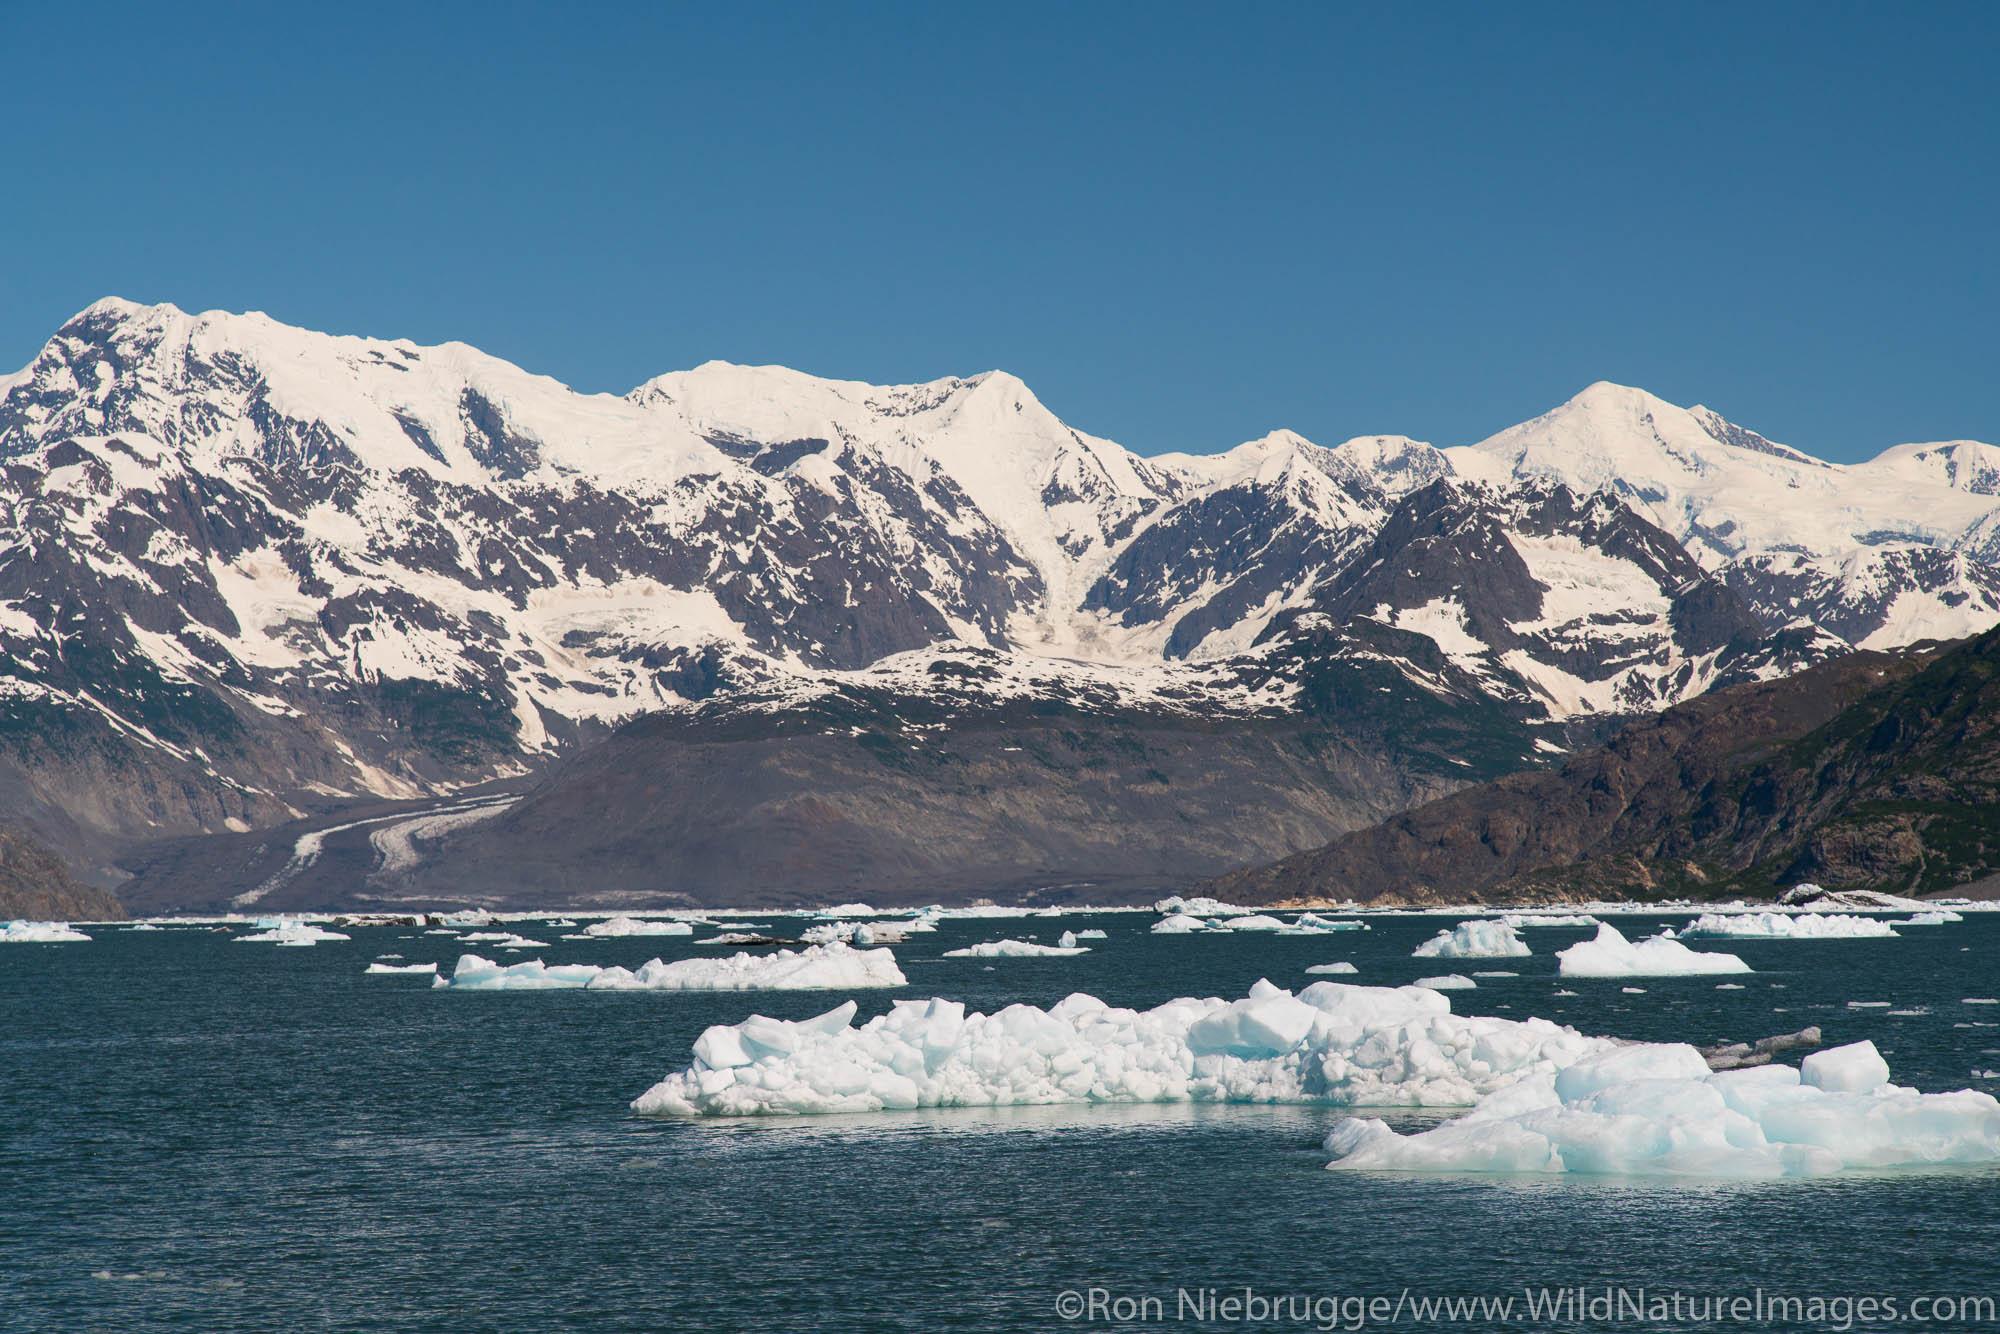 Prince William Sound, Chugach National Forest, Alaska